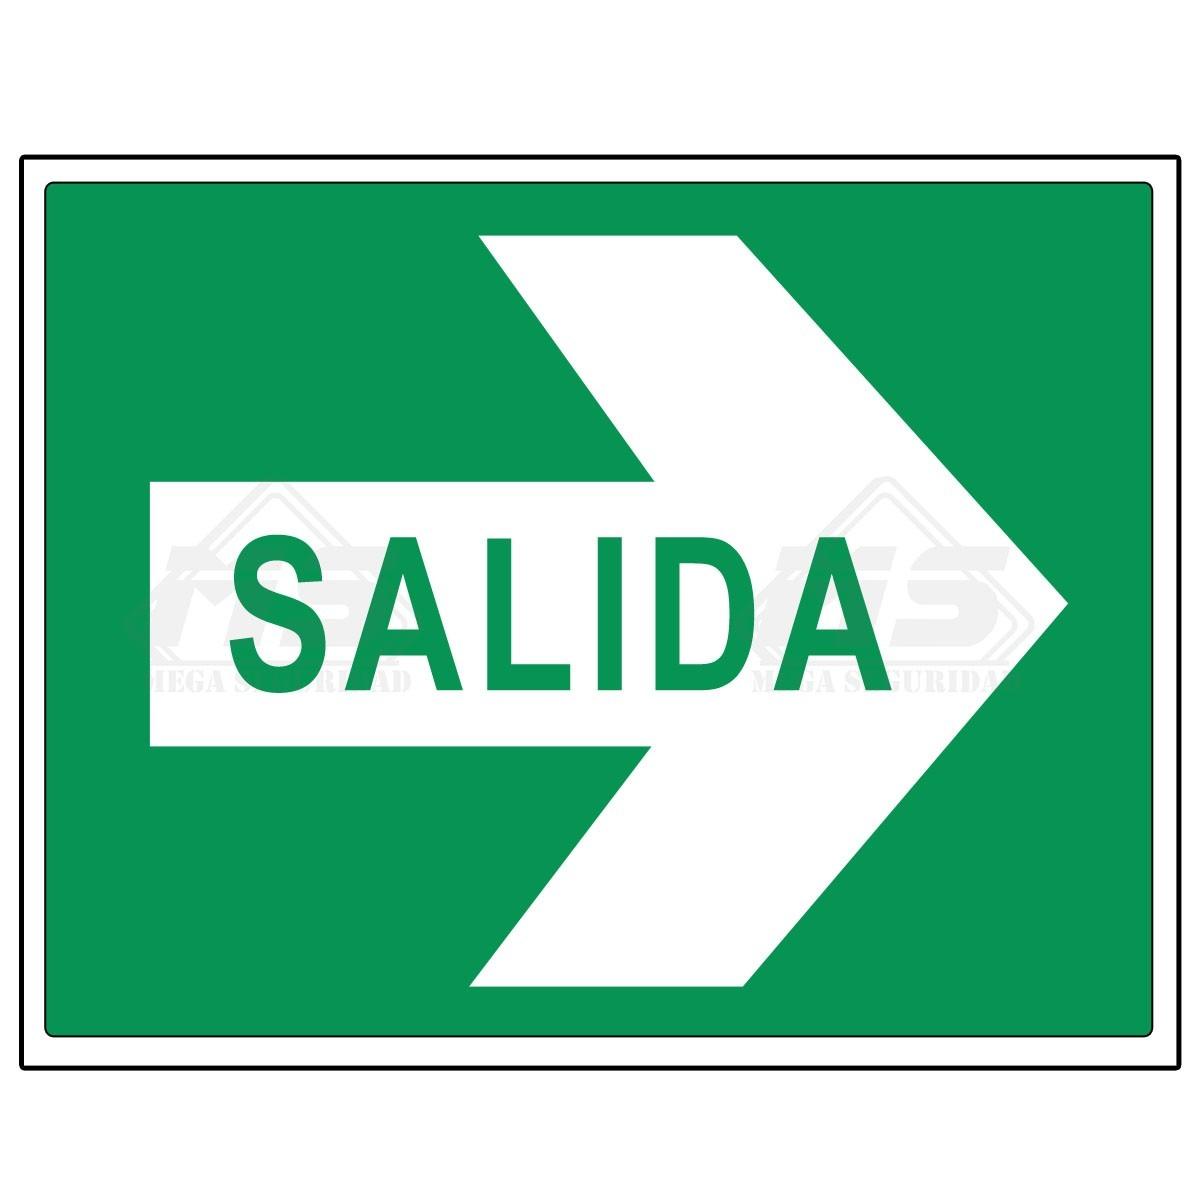 letrero-senalizacion-proteccion-20x25cm-salida-de-emergencia-19170-MLM20167626098_092014-F